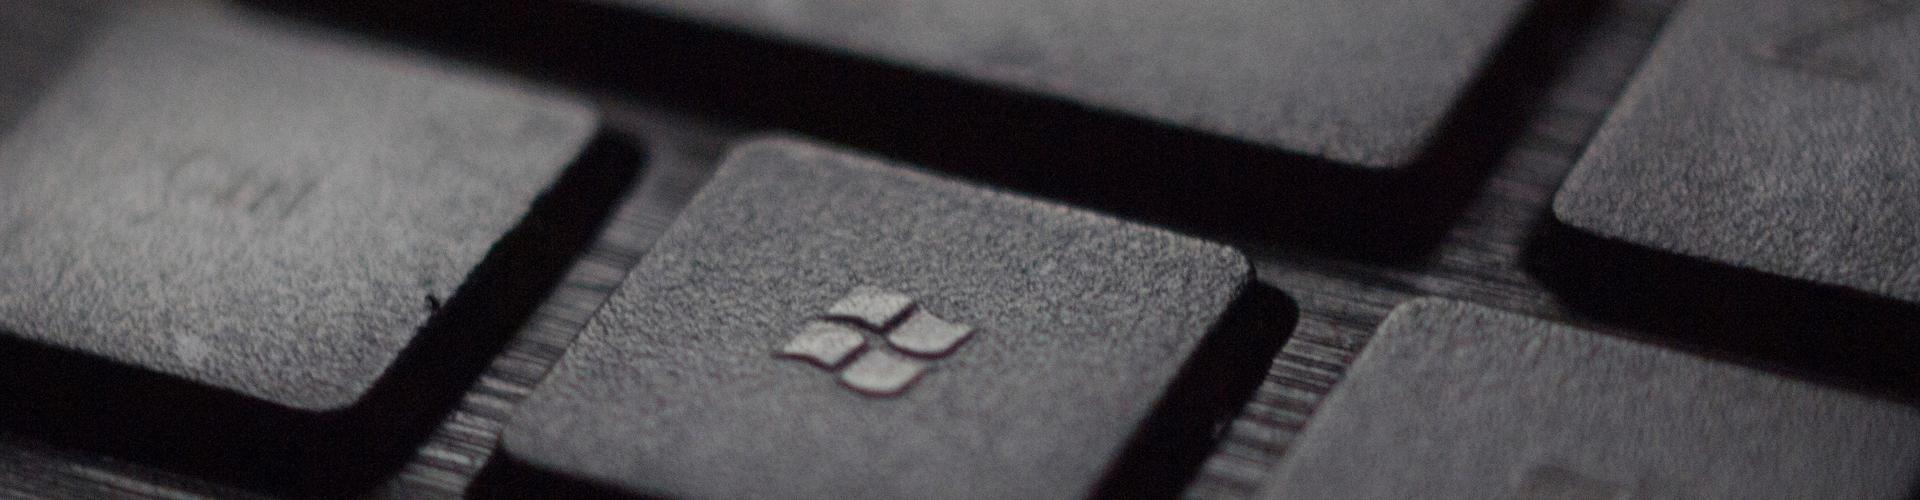 Microsoft | Audittrail